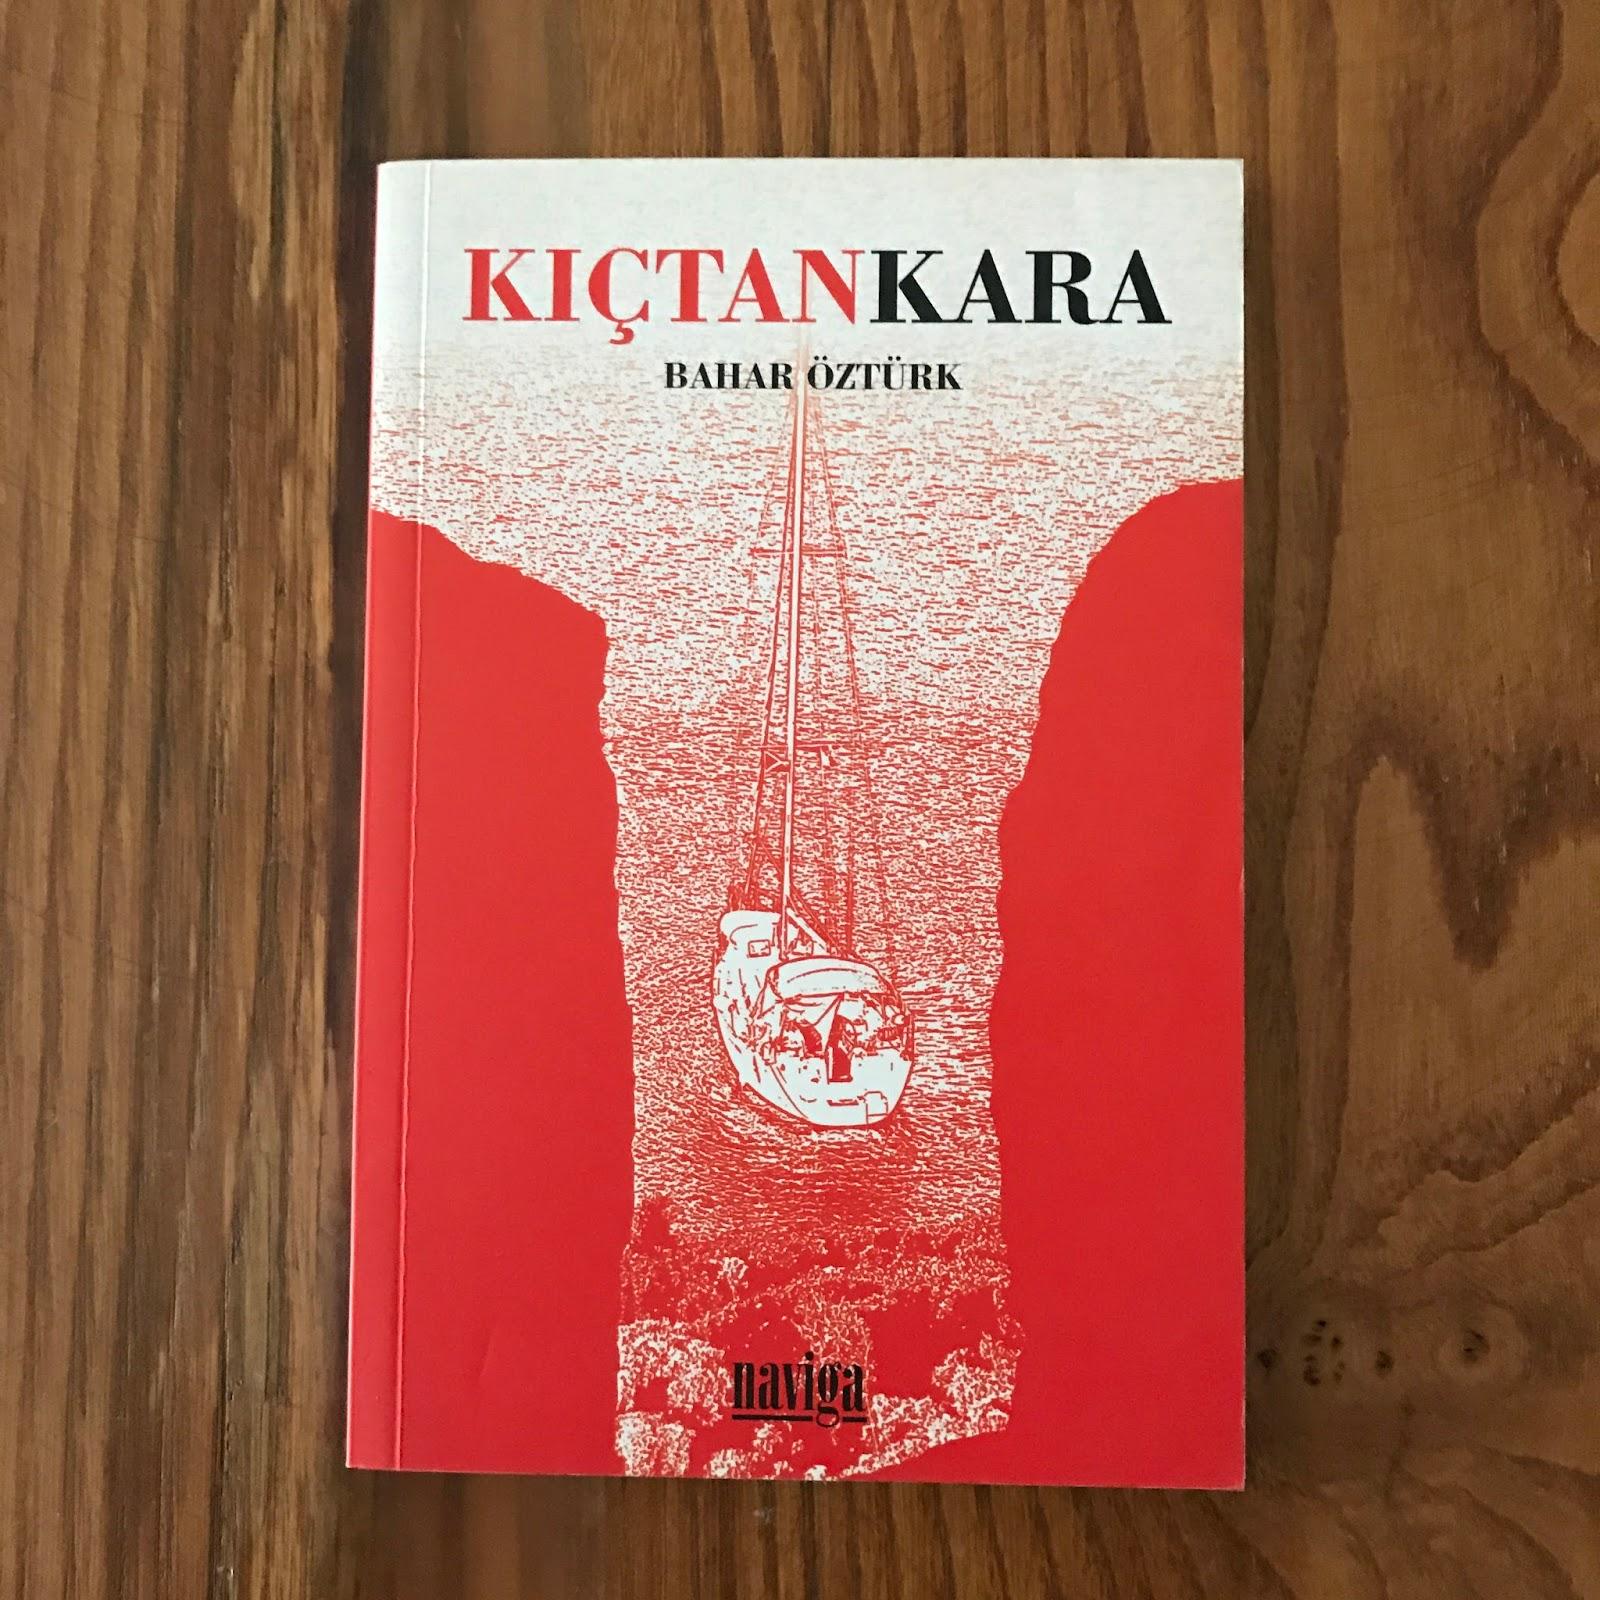 Bas Kahramani Insan Kaynaklari Uzmani Olan Bir Kitap: Kictankara (Kitap)